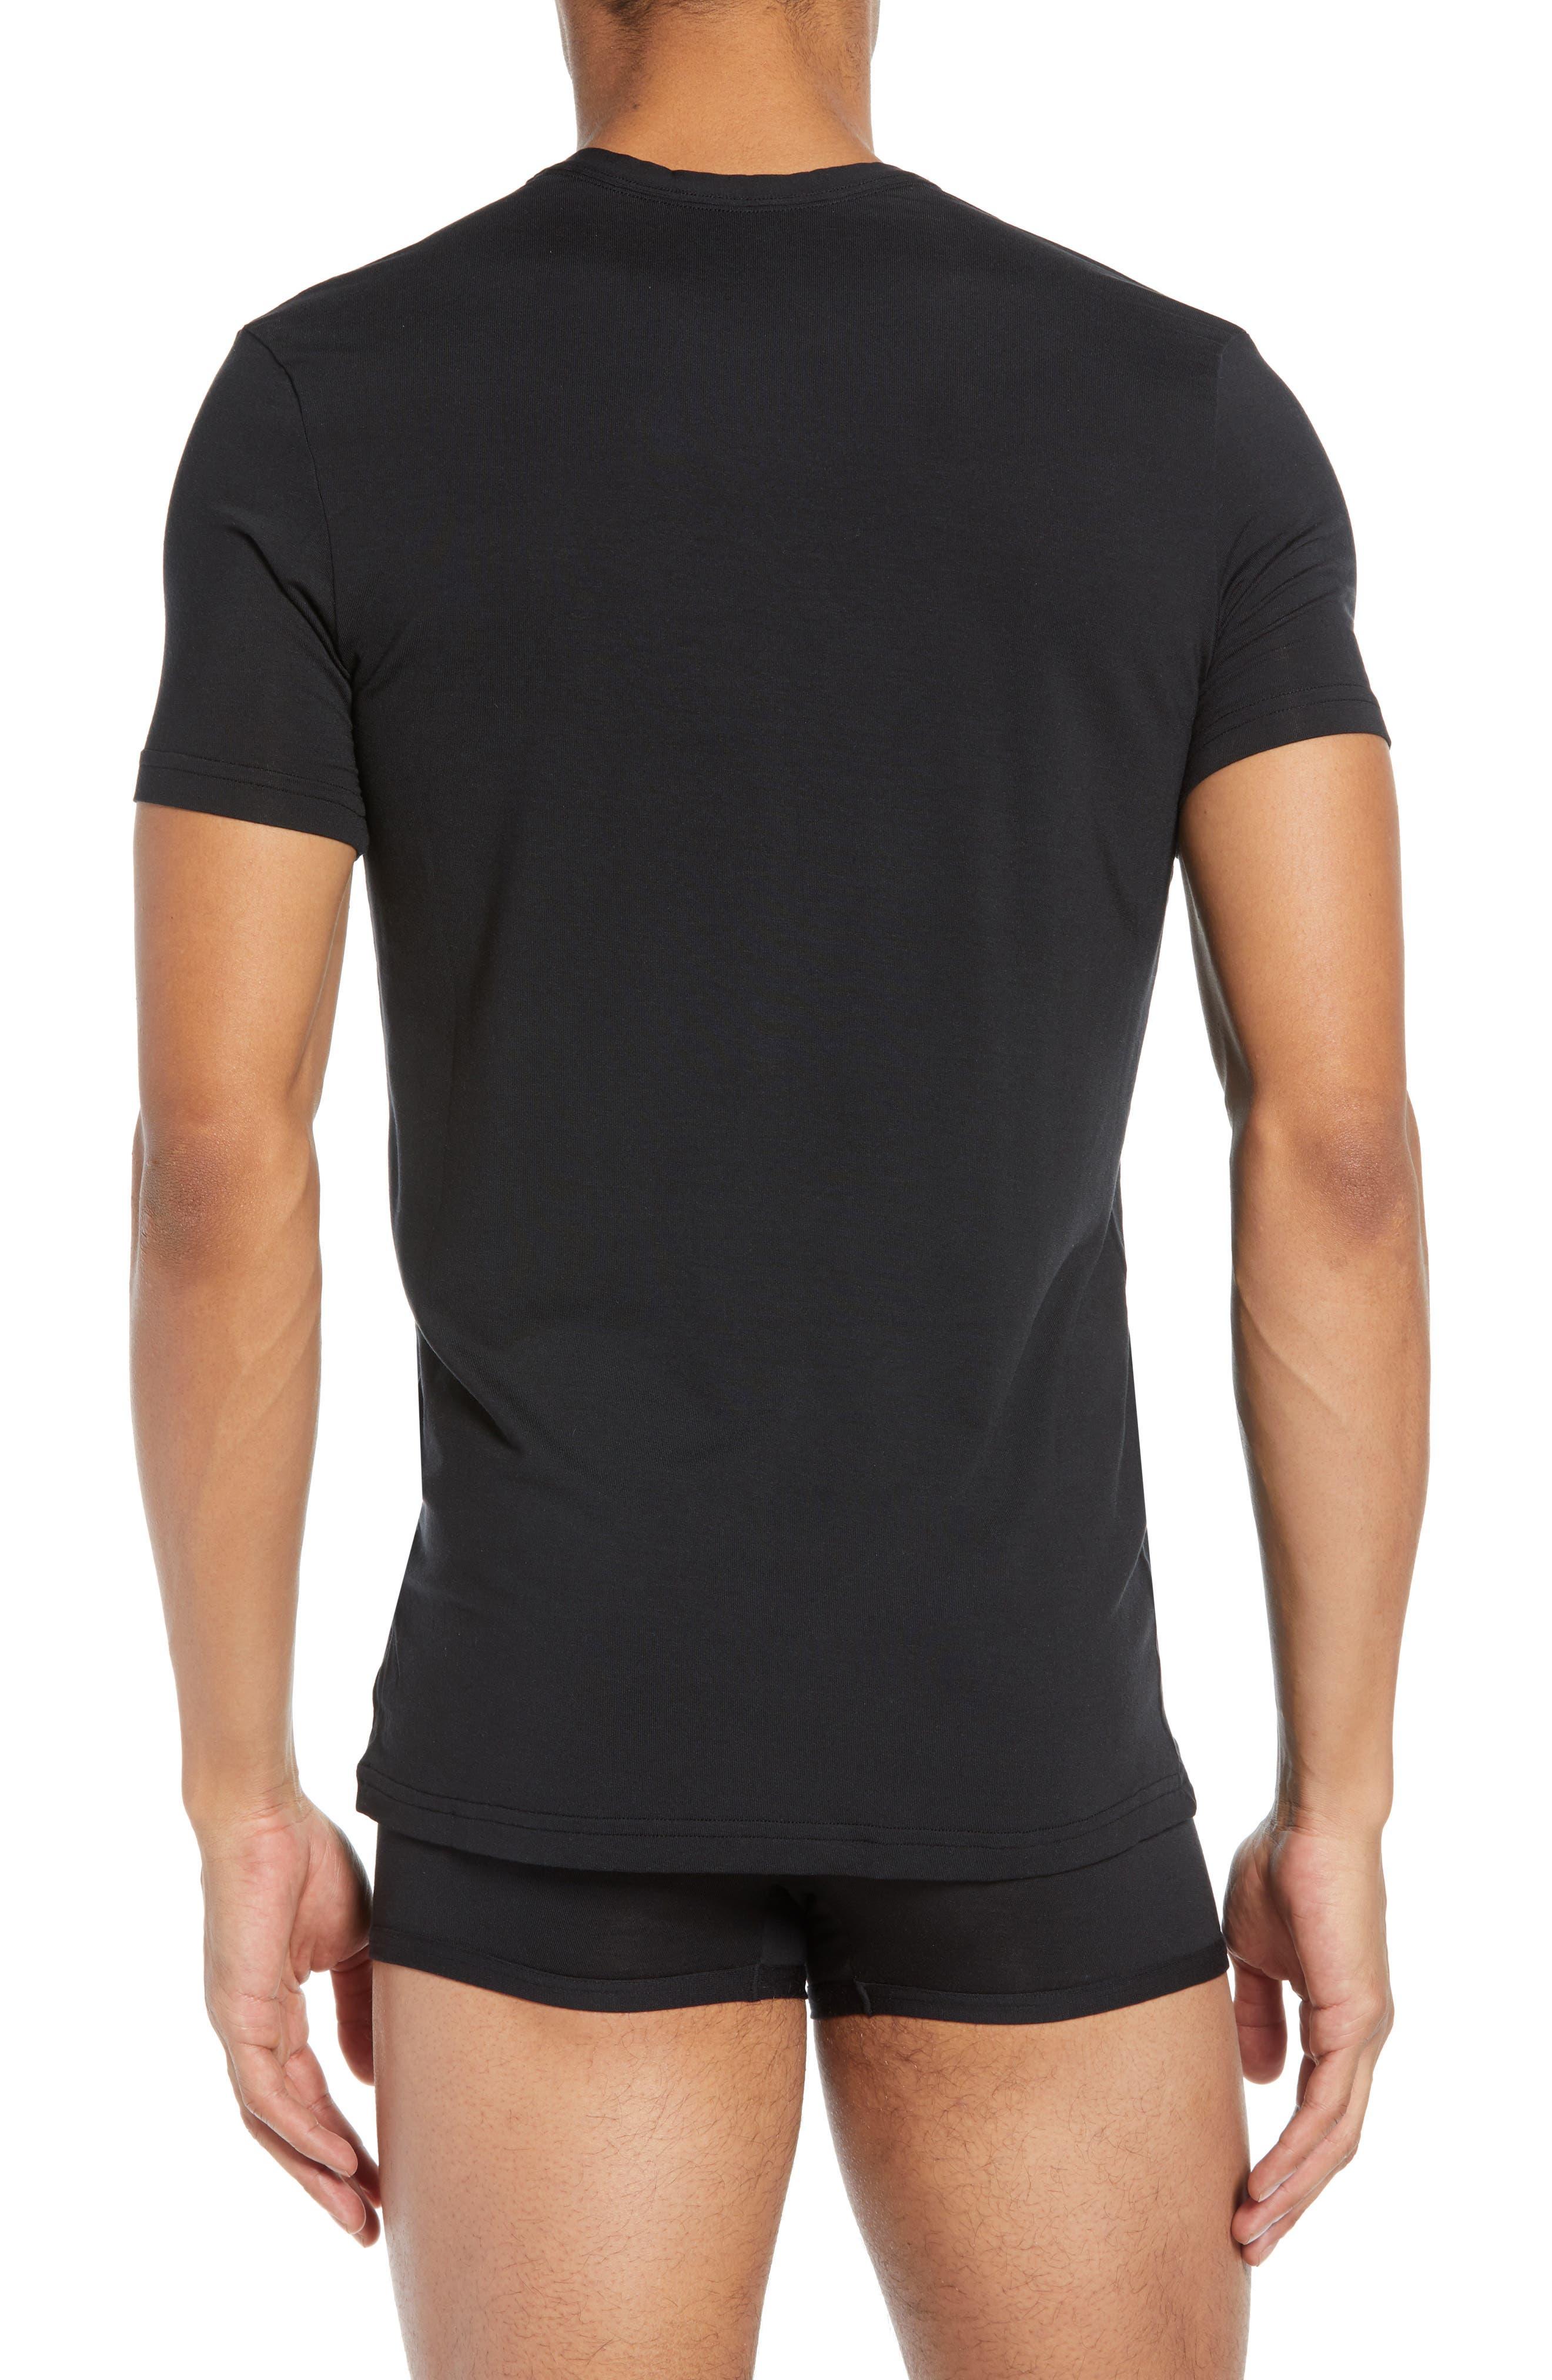 CALVIN KLEIN, Ultrasoft Stretch Modal Blend Crewneck T-Shirt, Alternate thumbnail 2, color, BLACK